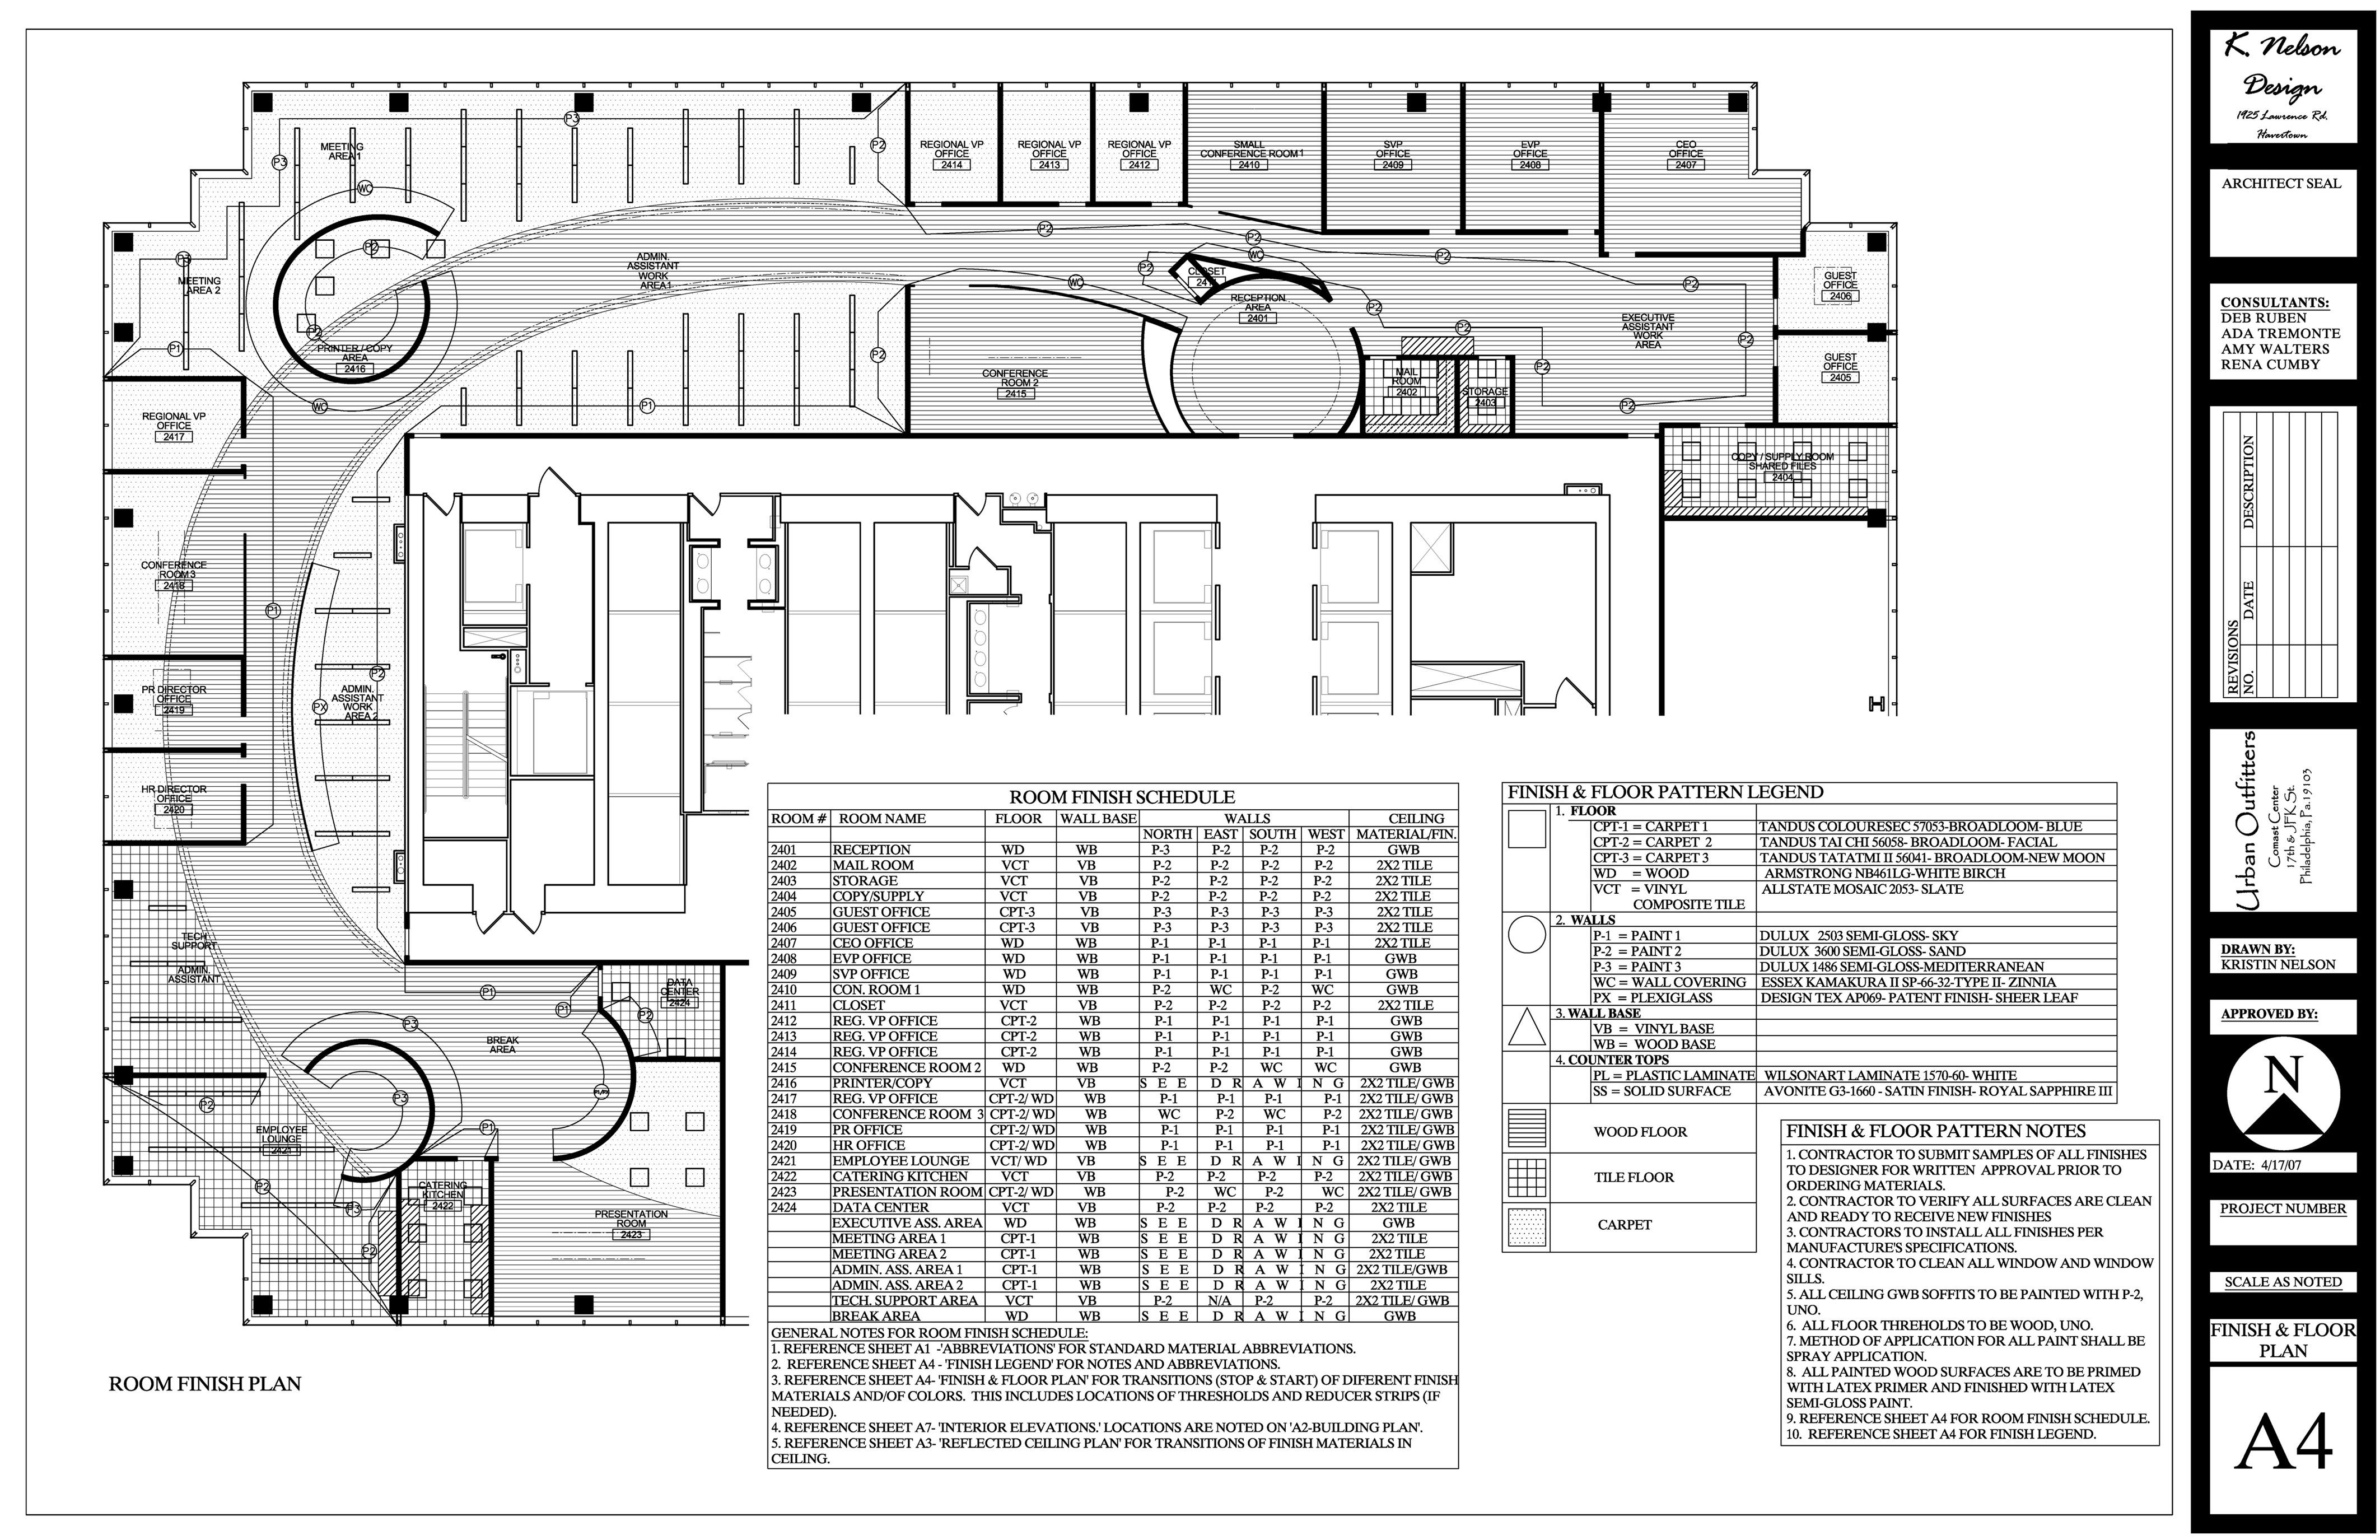 Construction Documents By Kristin M Nelson At Coroflot Com